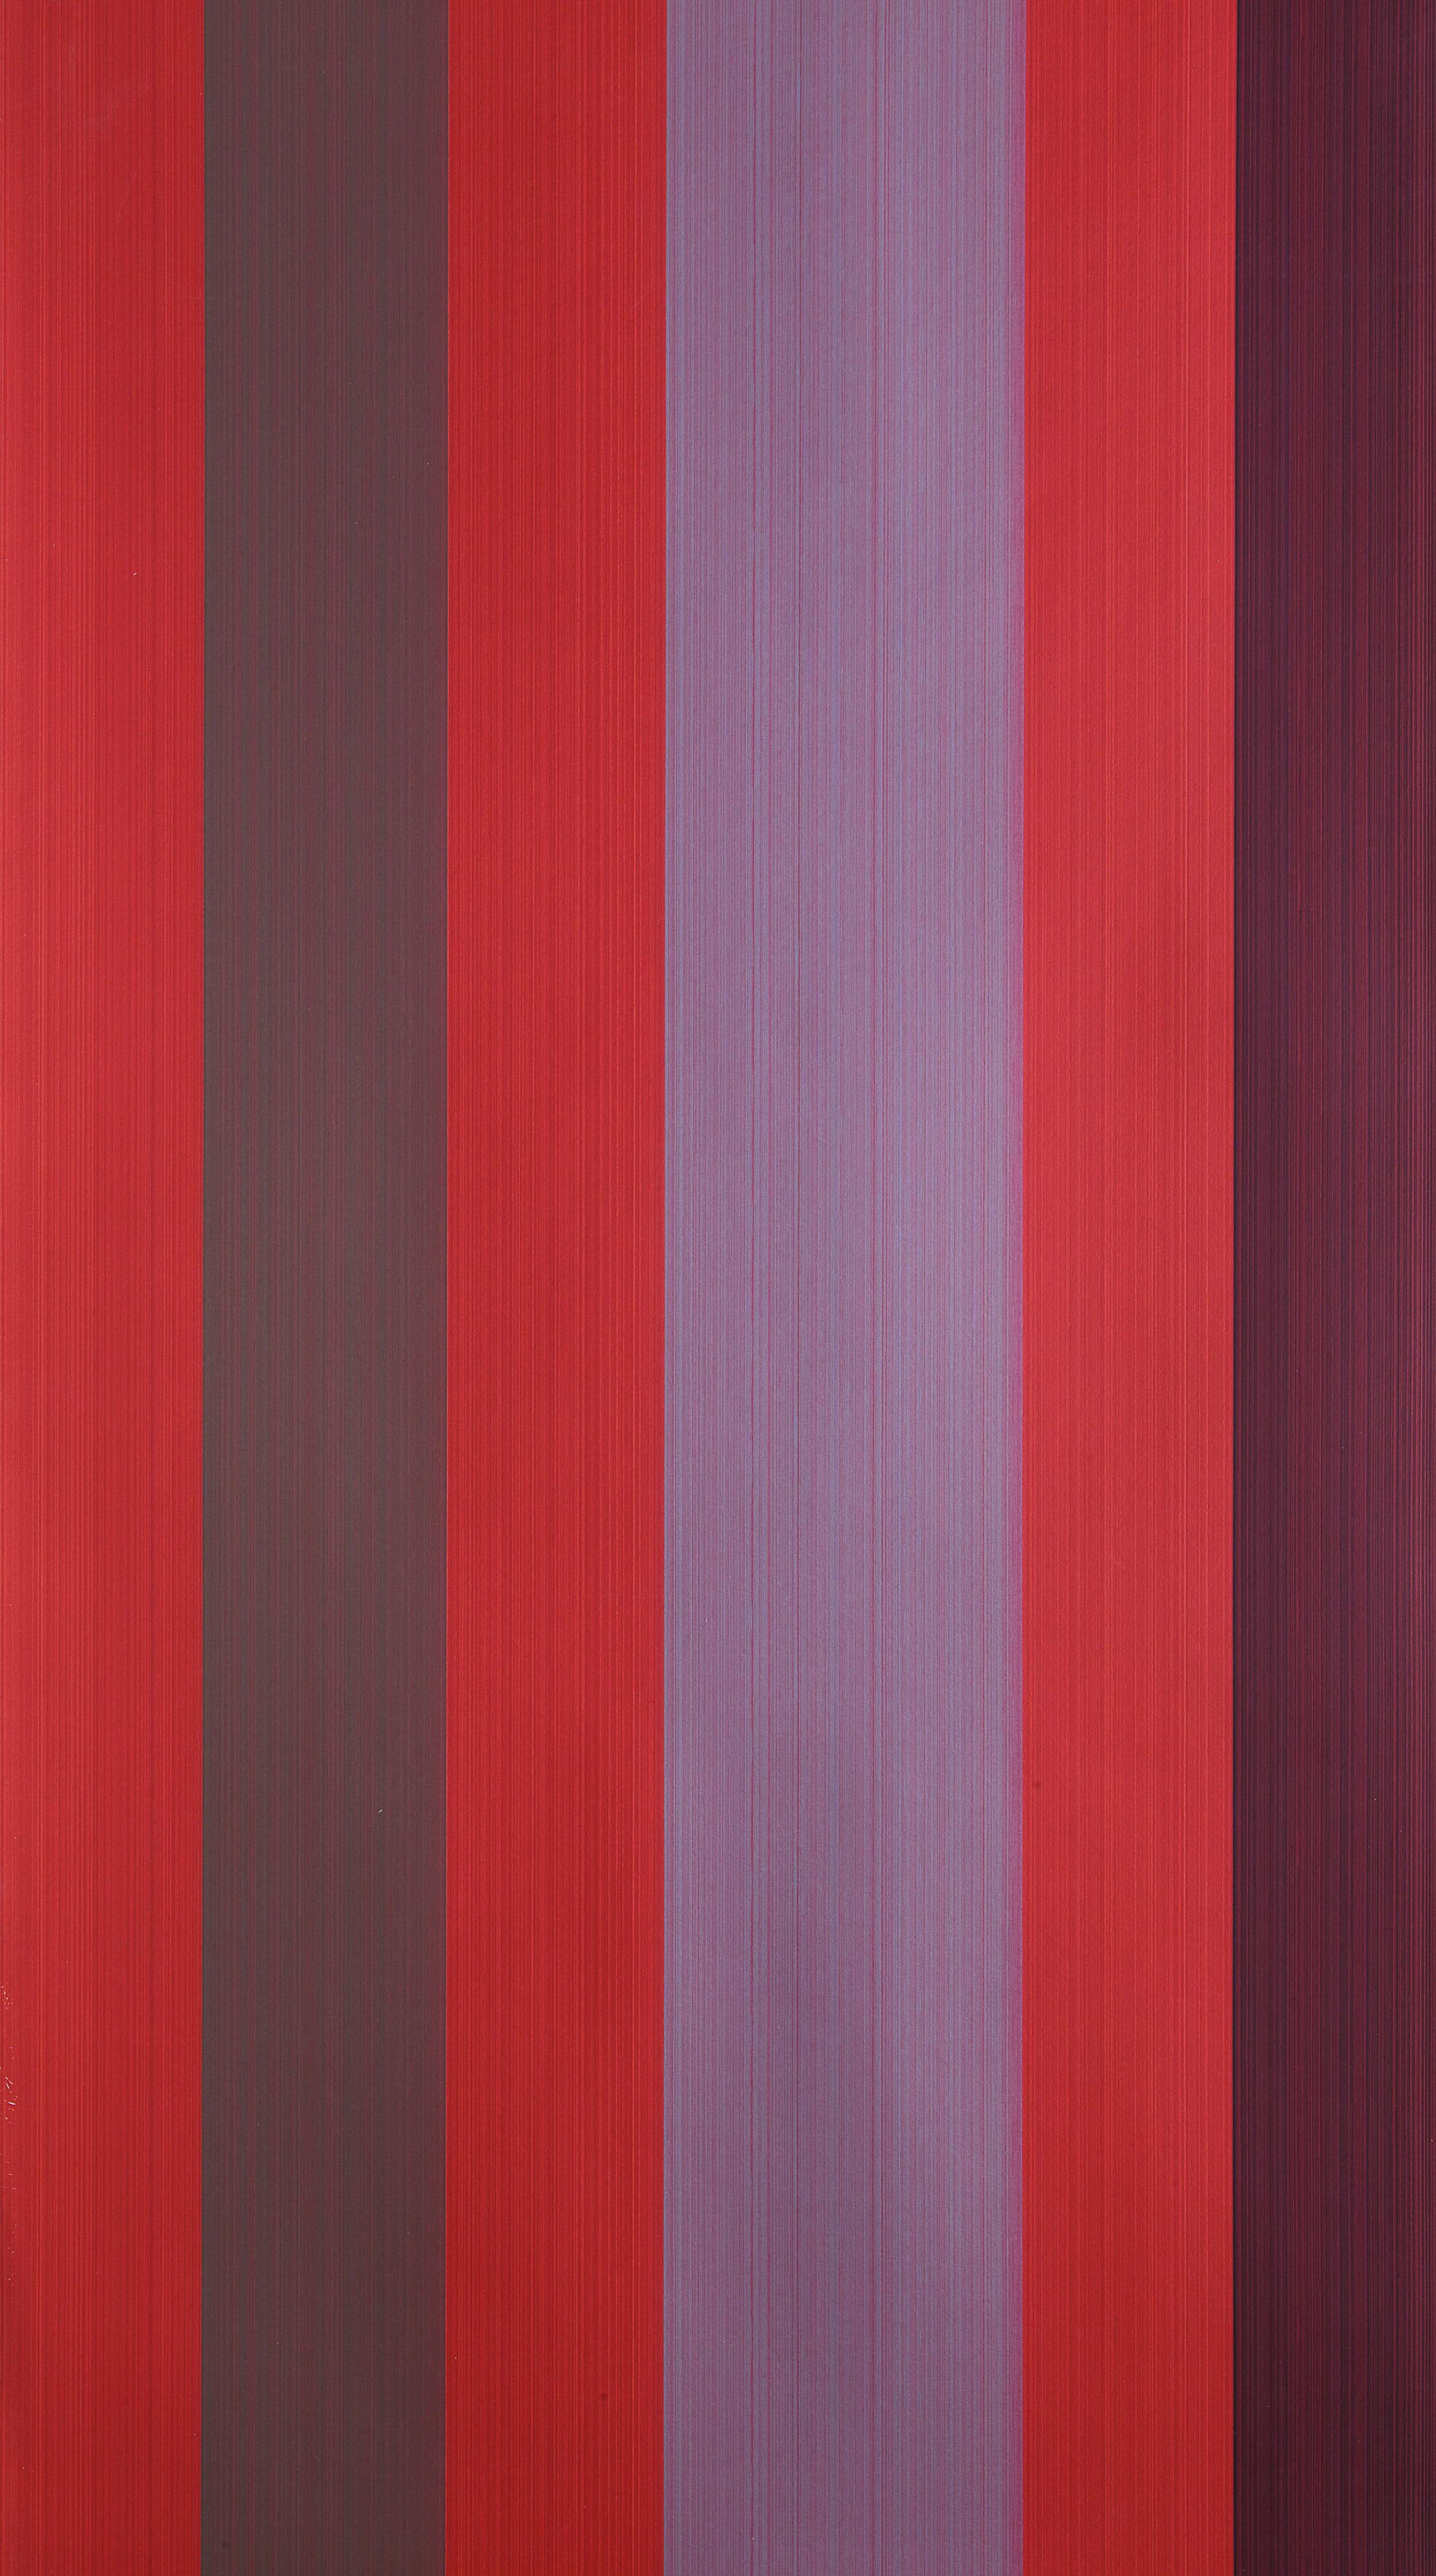 Chromatic Stripe 4203 $195 Per Roll  Order Now